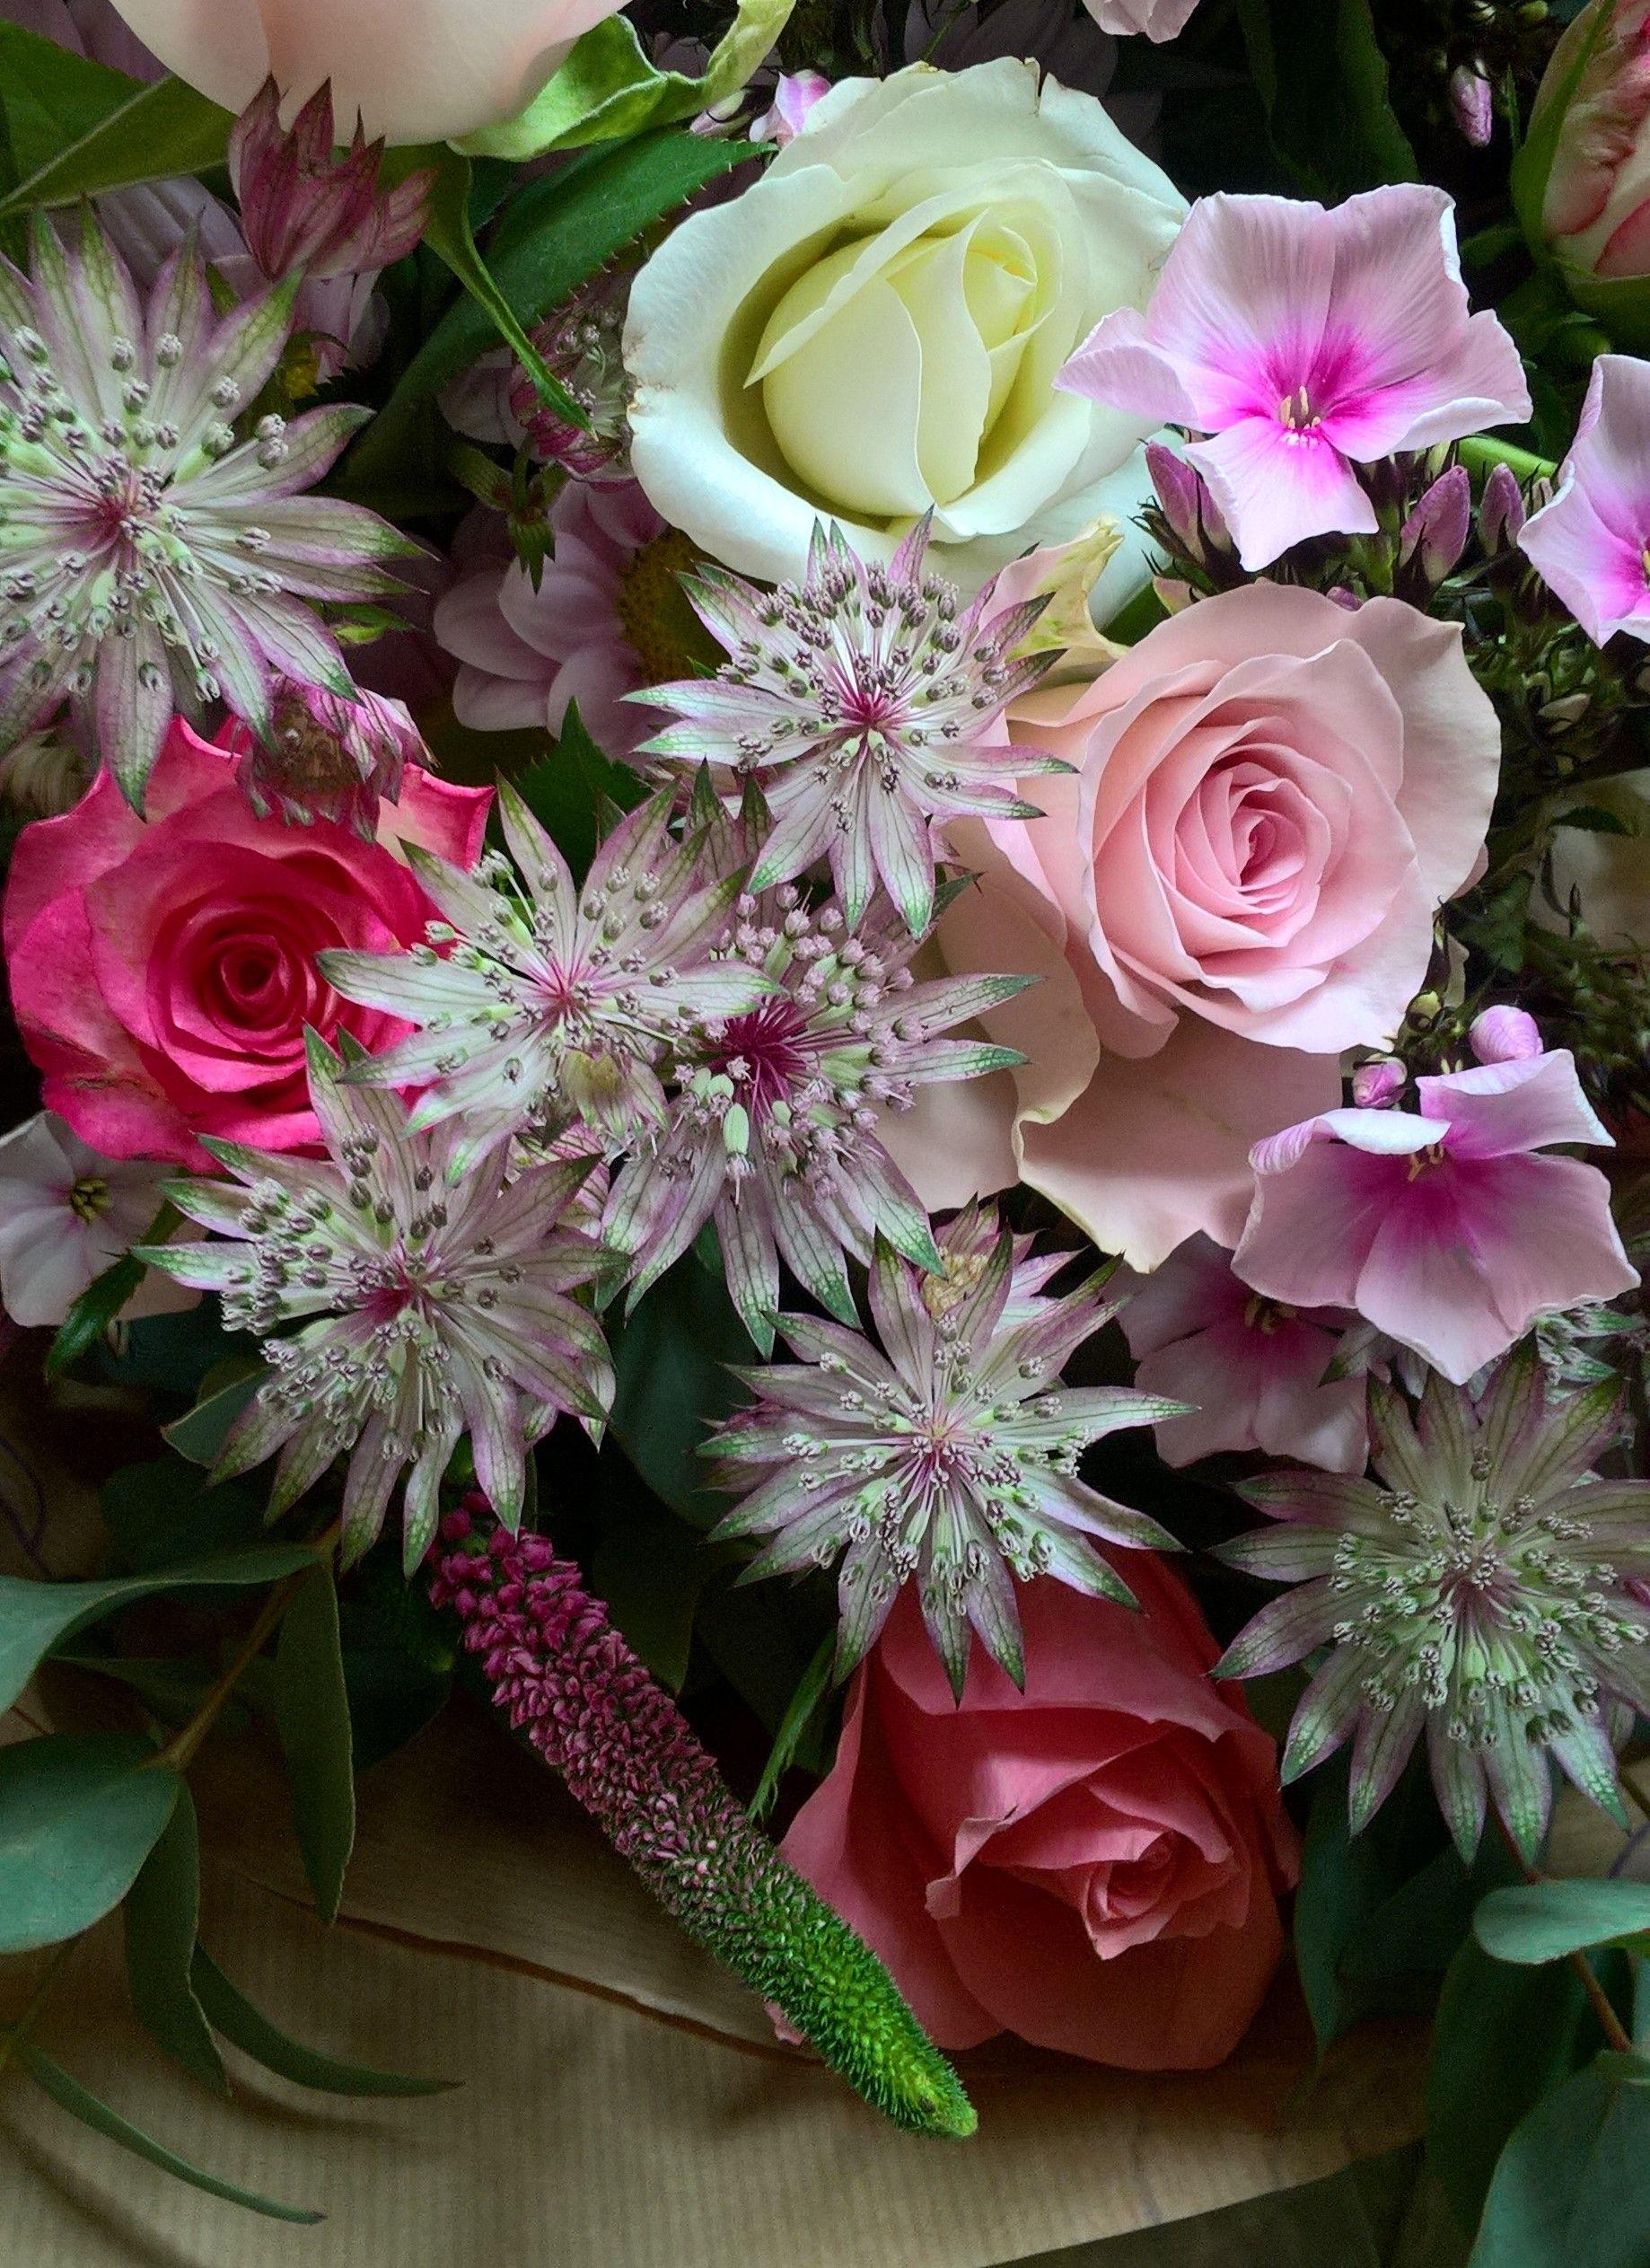 Astrantia Veronica And Phlox Beautiful Seasonal Spring Flowers